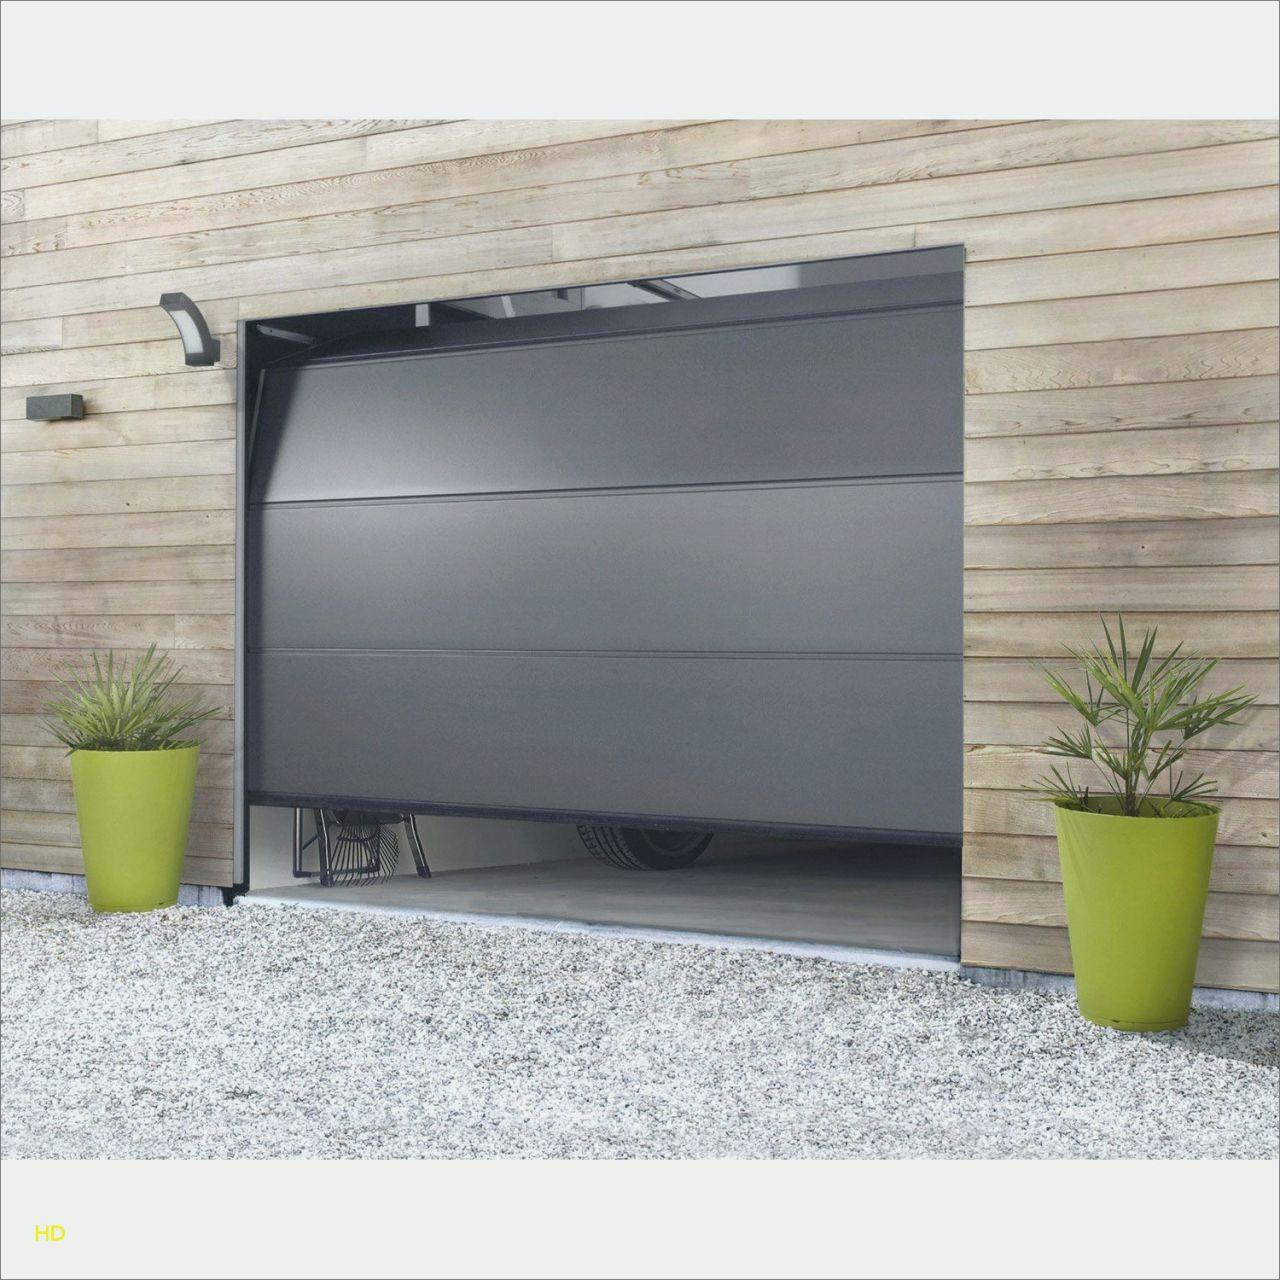 201 Prix Porte De Garage Sectionnelle Check More At Https Www Dtvuy Info Prix Porte De Garage Sectionnelle